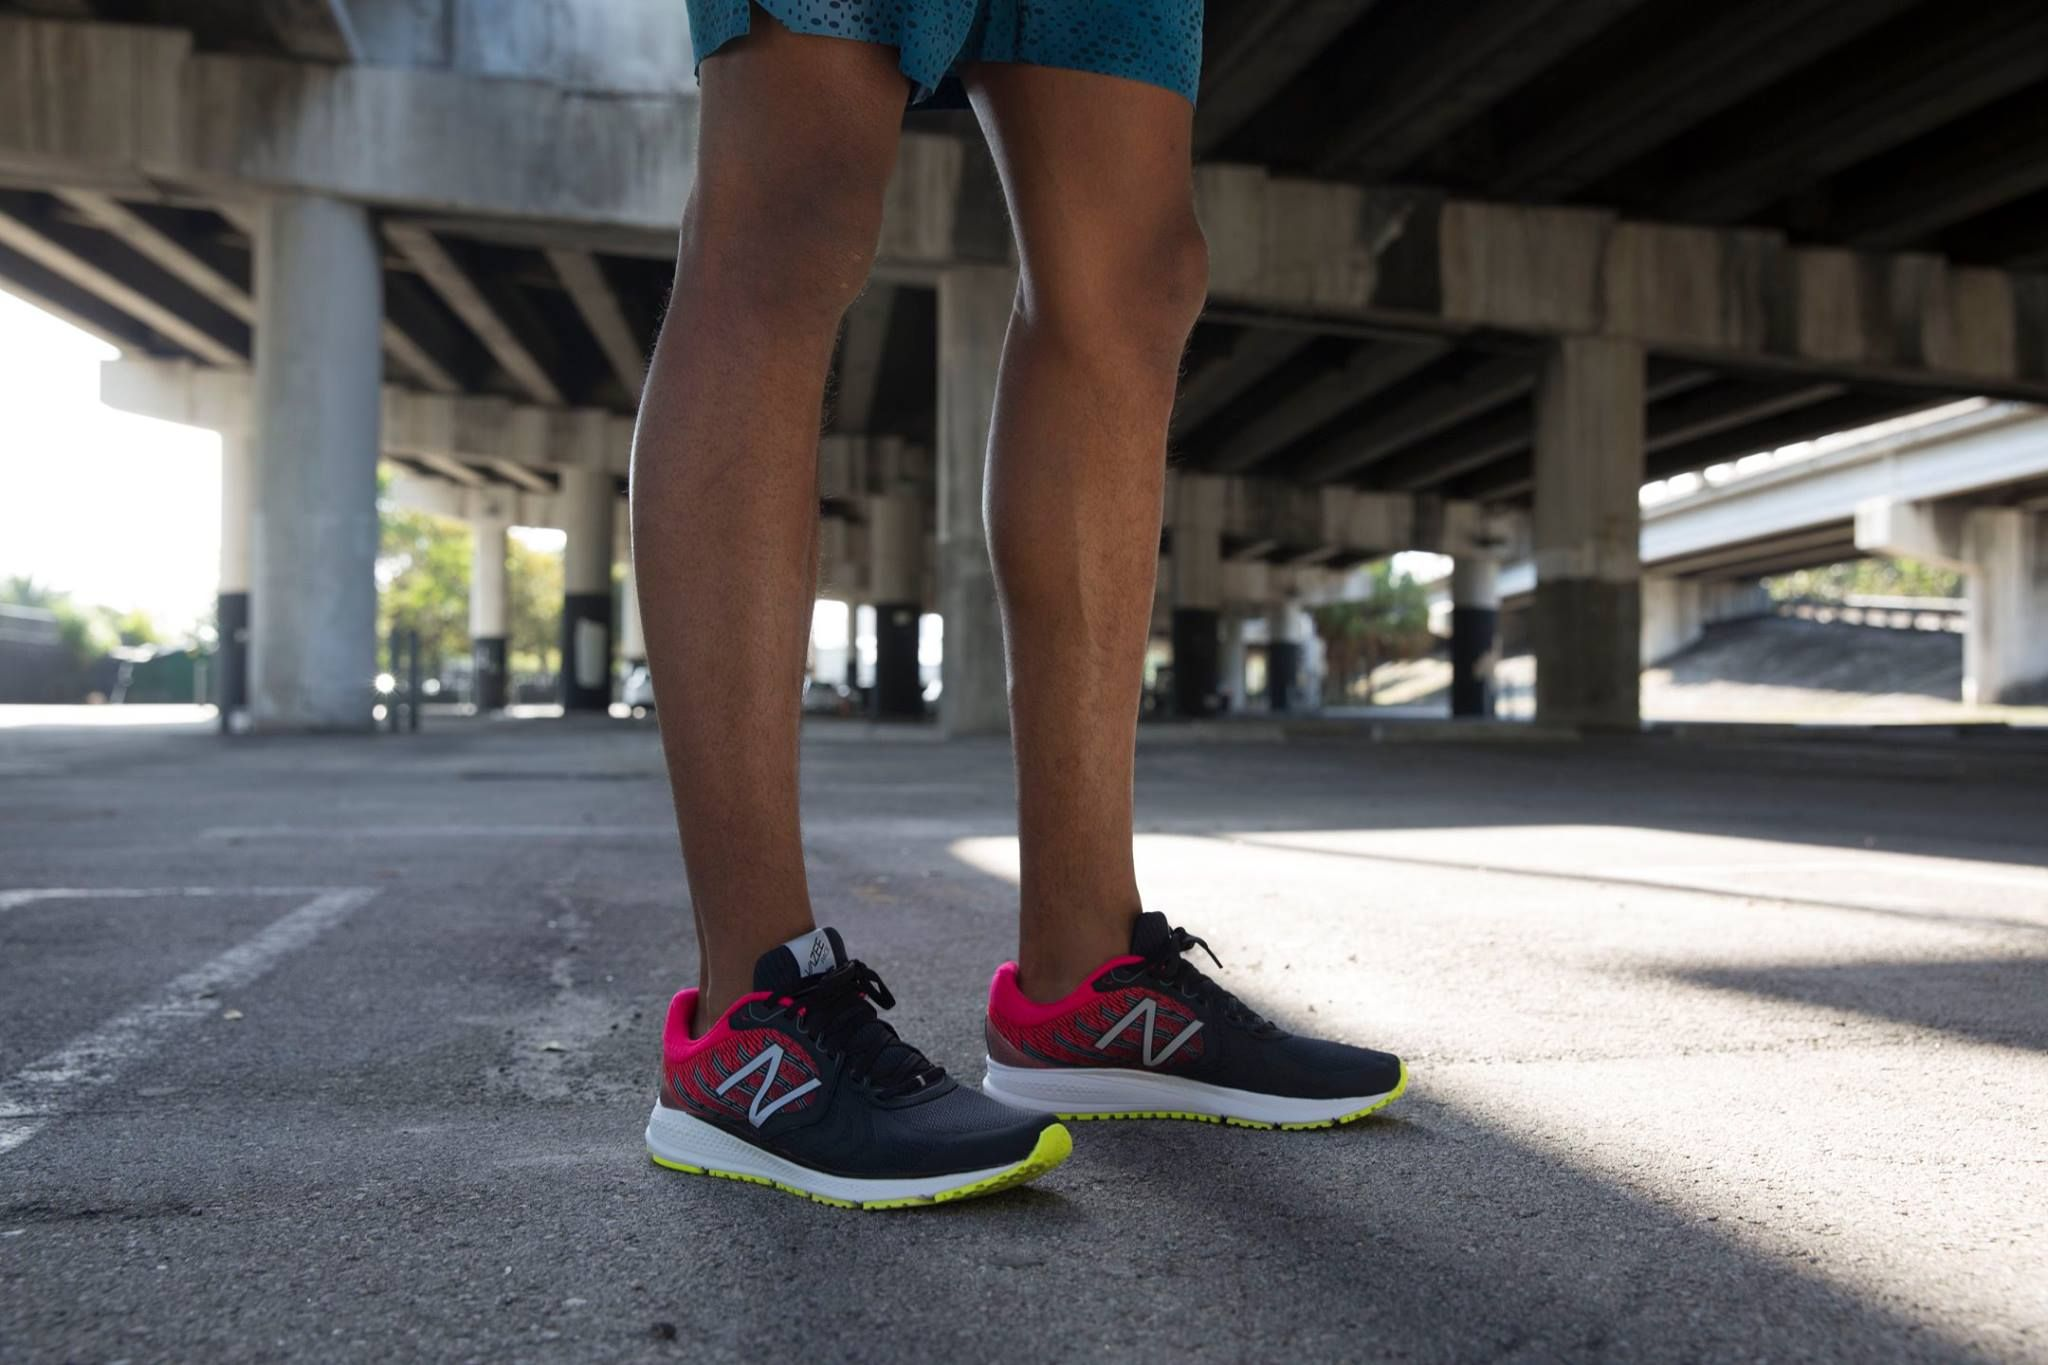 Nowa Definicja Szybkosci Vazee Pace V2 Sneakers Nike Running Inspiration Sneakers